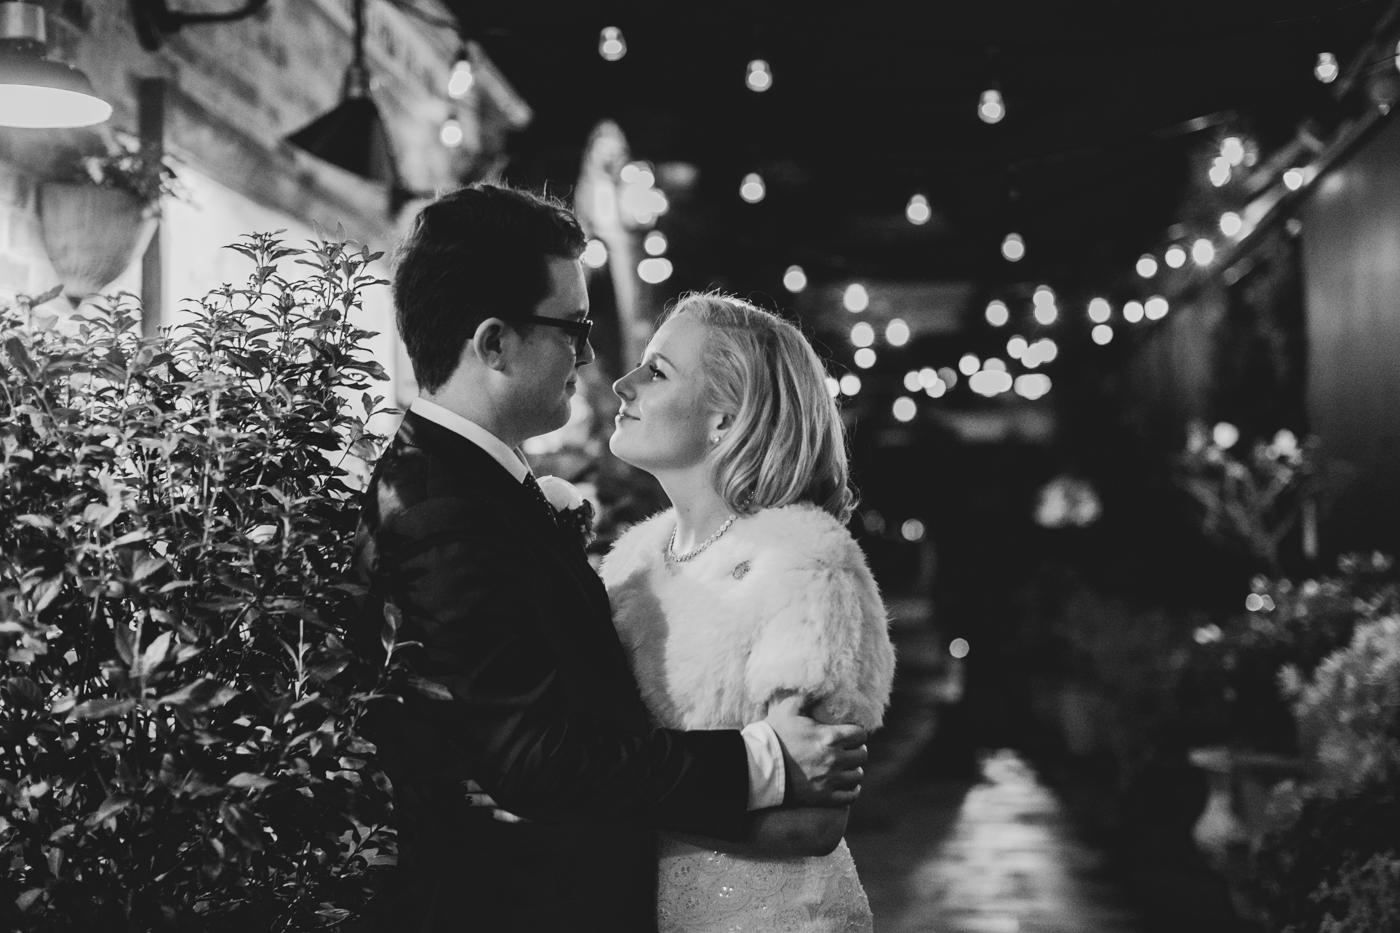 Jo & Tom Wedding - The Grounds of Alexandria - Samantha Heather Photography-334.jpg